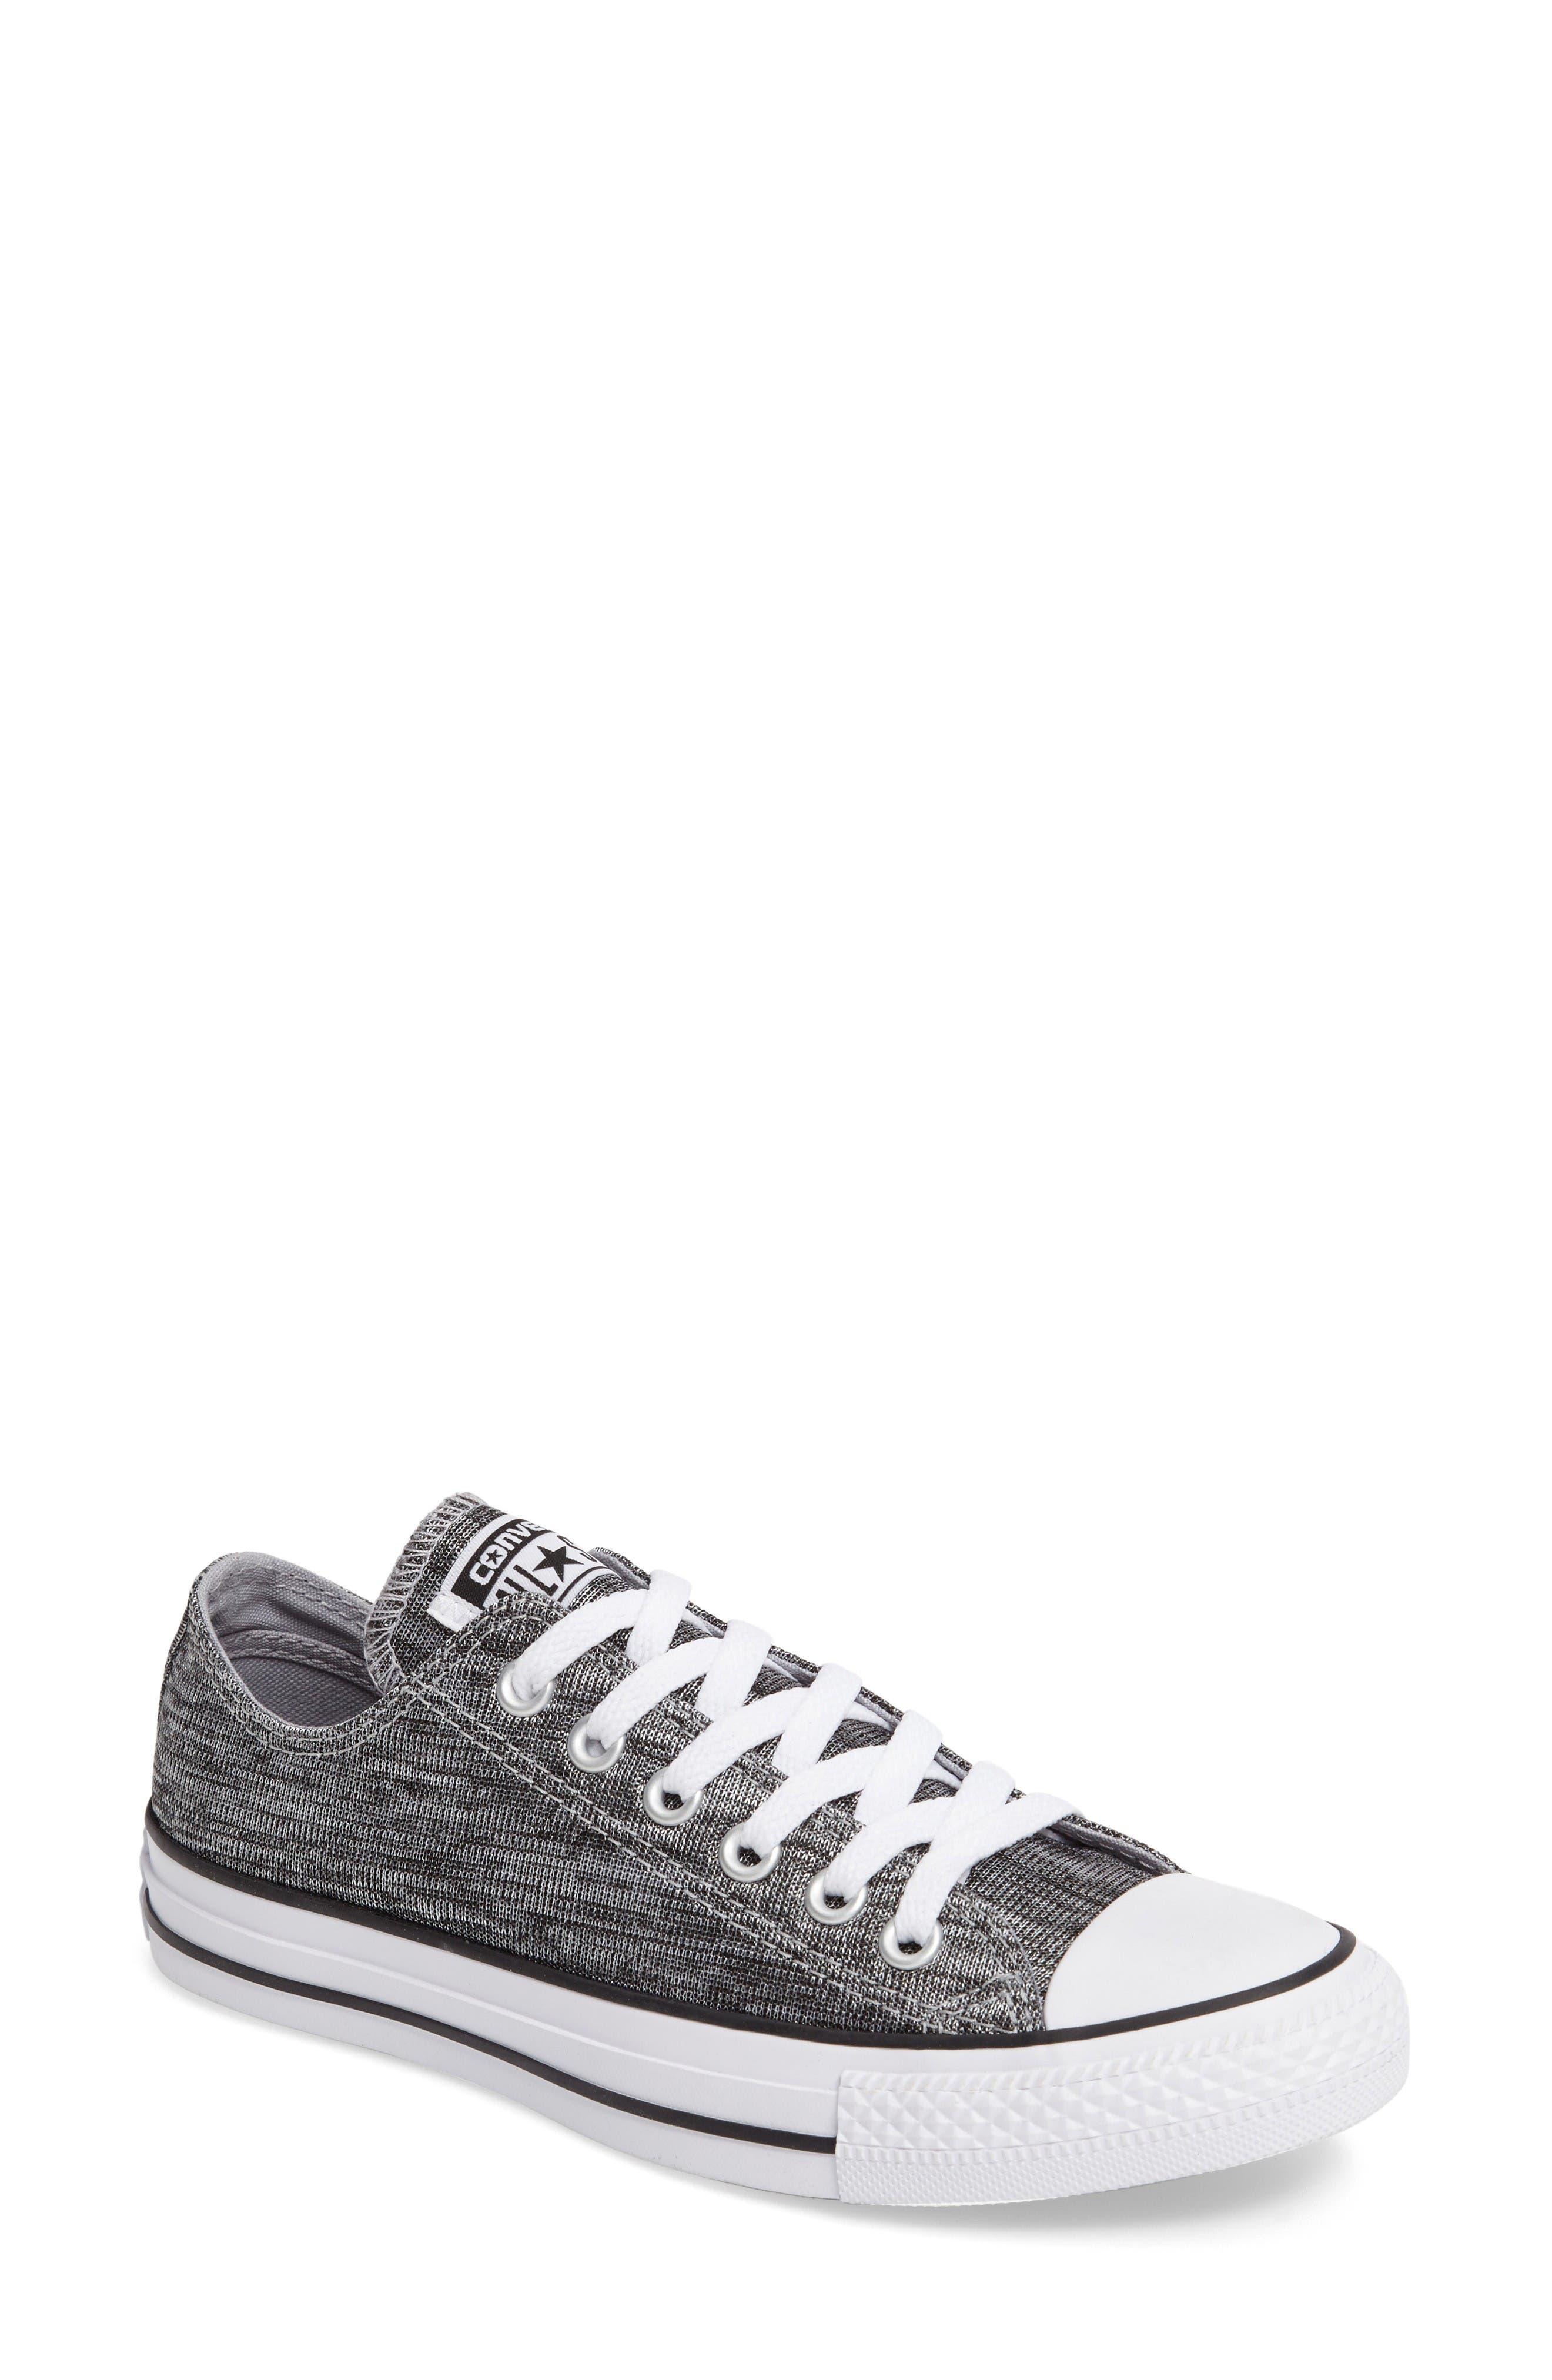 Converse Chuck Taylor® All Star® Knit Low Top Sneaker (Women)